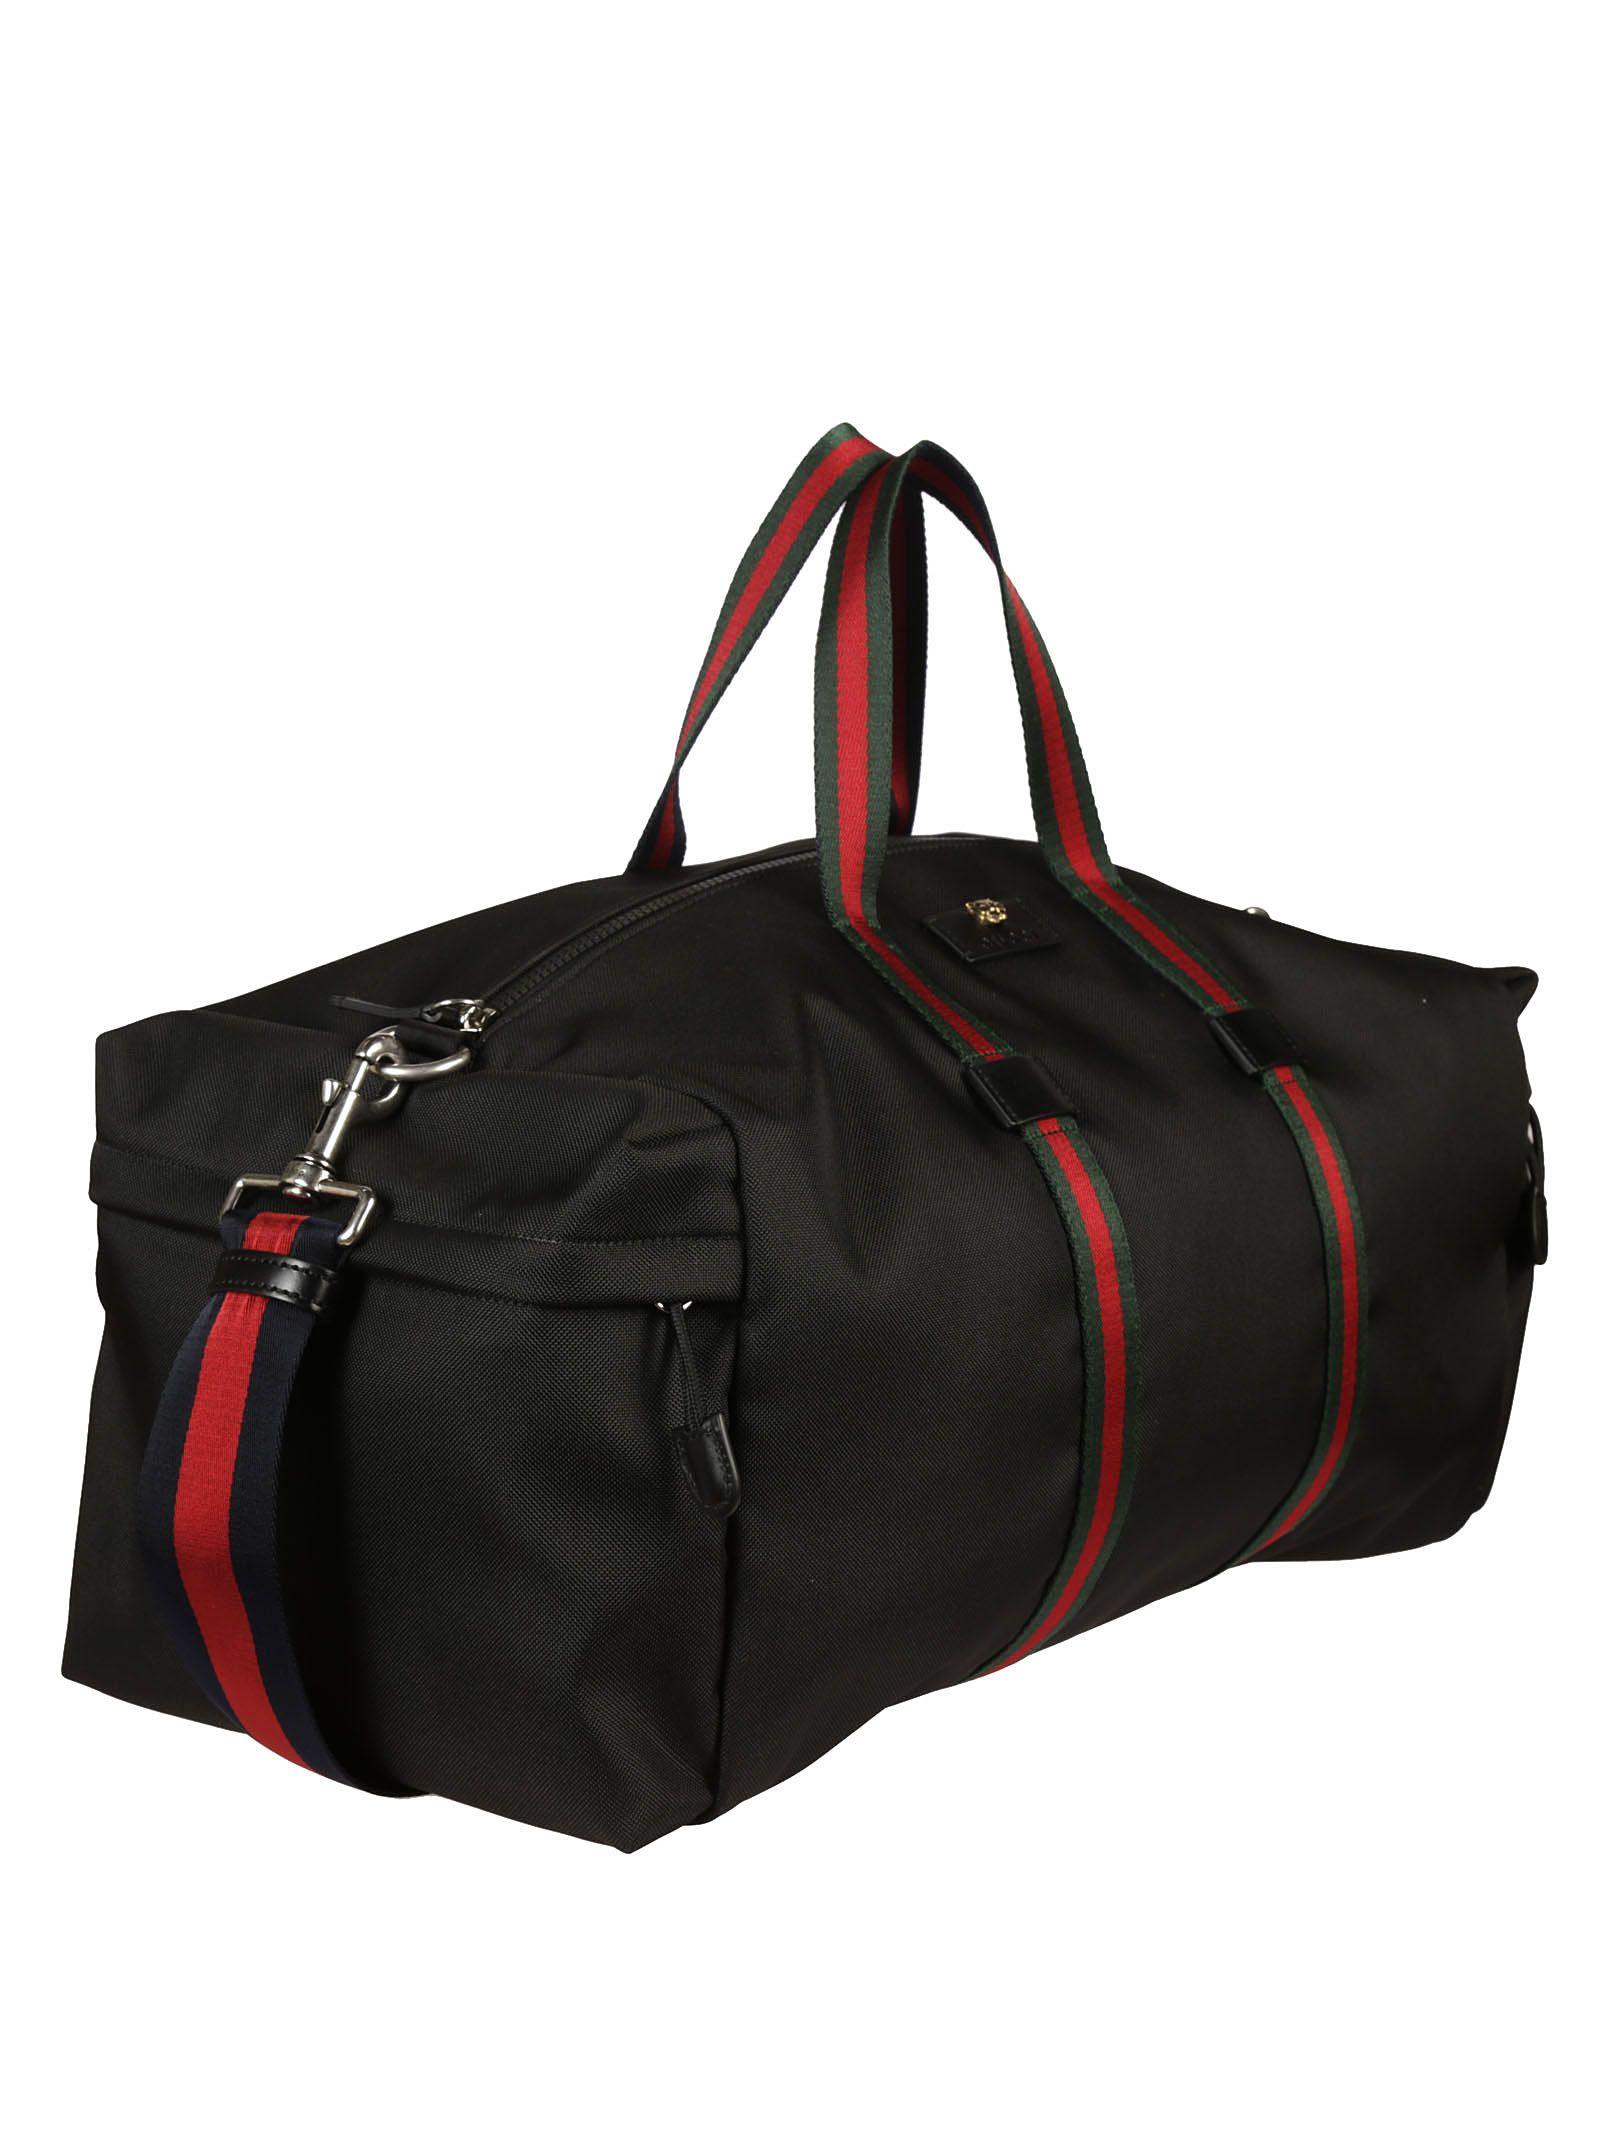 Gucci - Gucci Technical Canvas Duffle Bag - Black, Men's Luggage ...